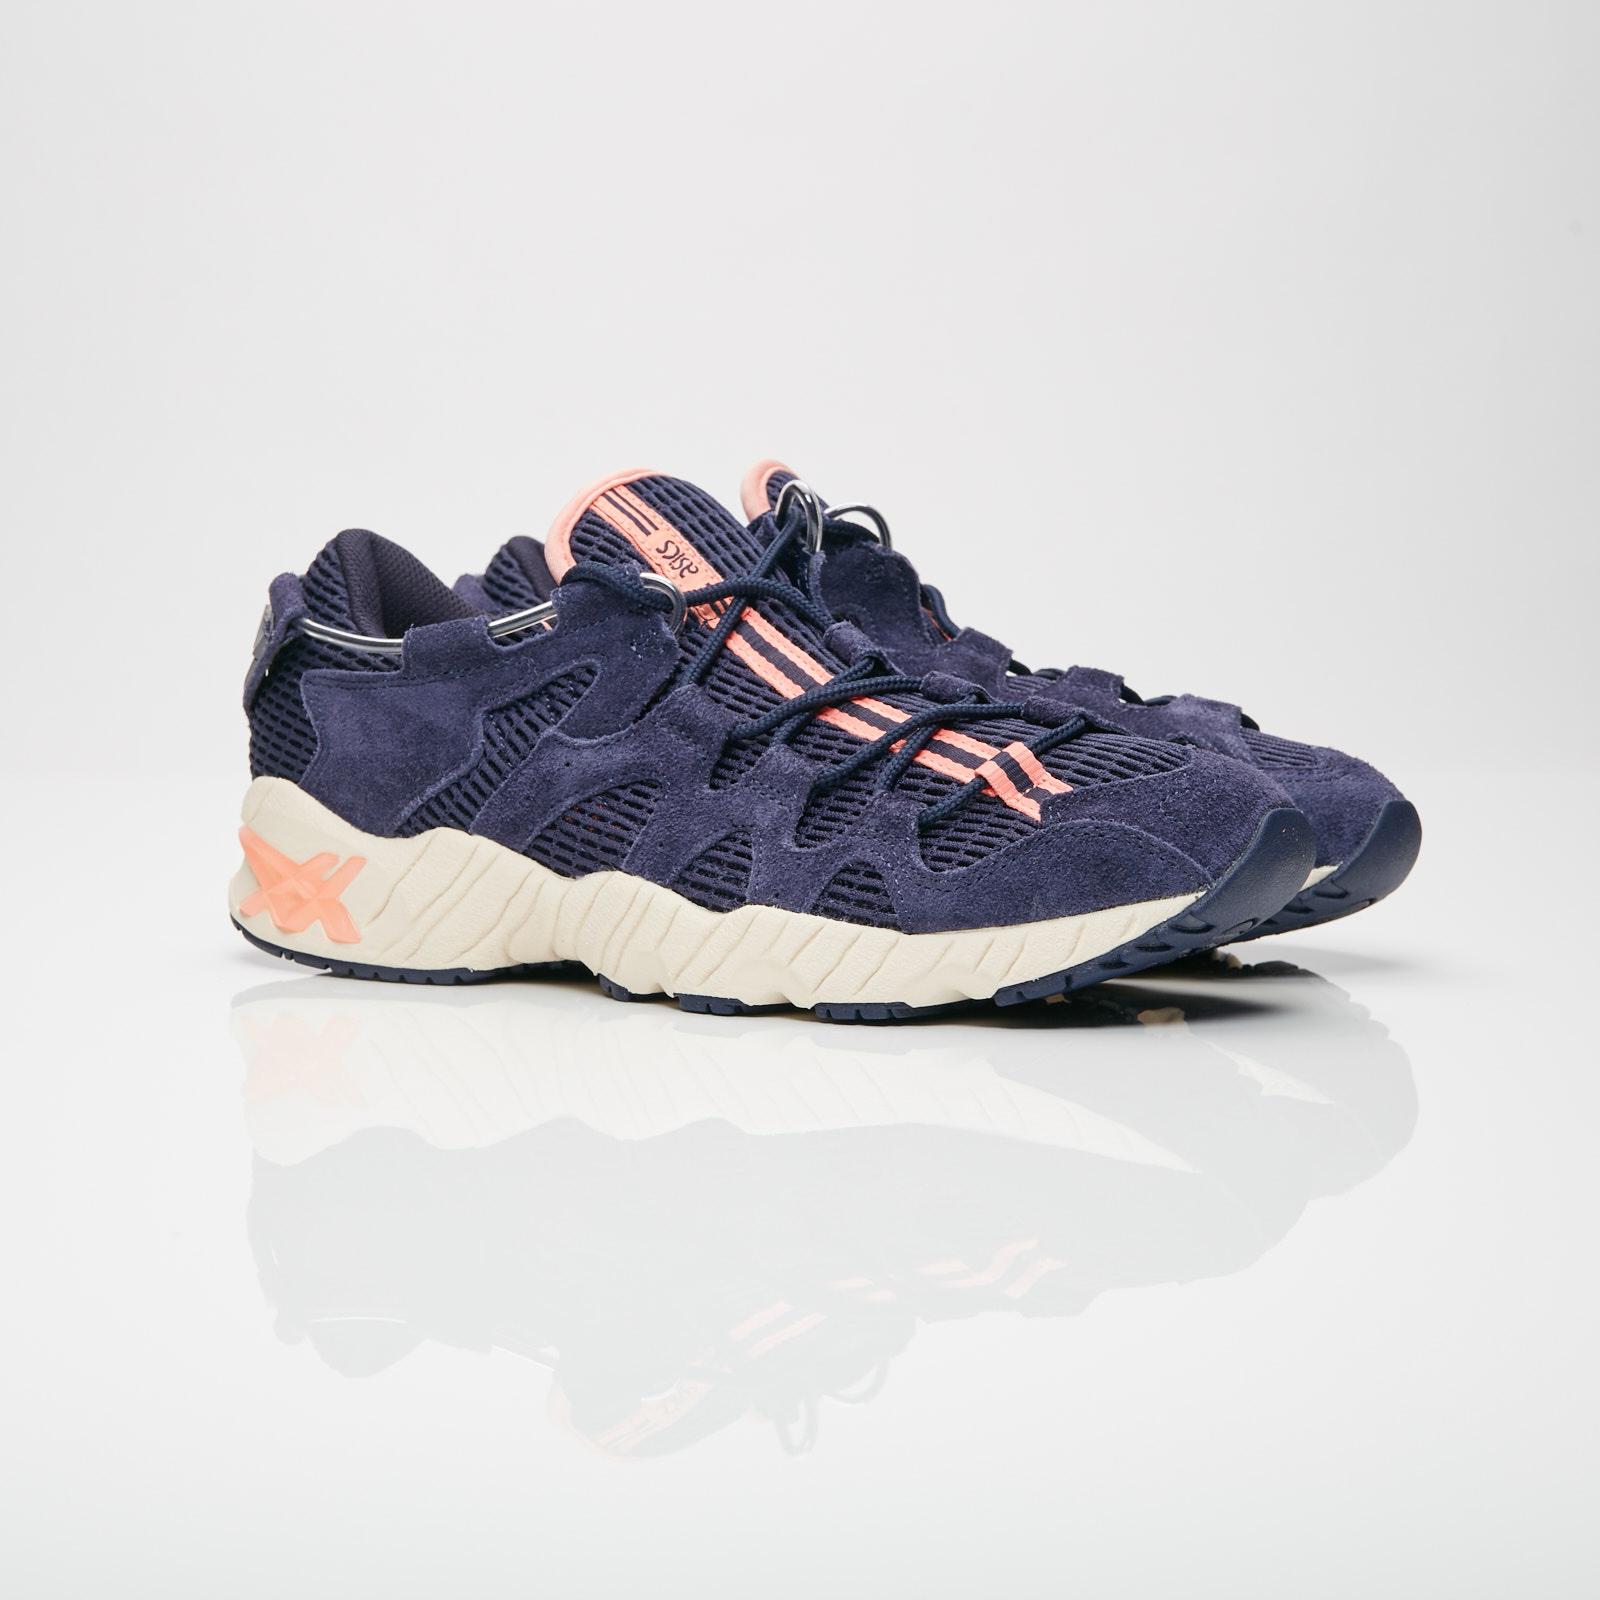 quality design 51f1f 7c3ff ASICS Tiger Gel-Mai - H8e3n-5858 - Sneakersnstuff | sneakers ...